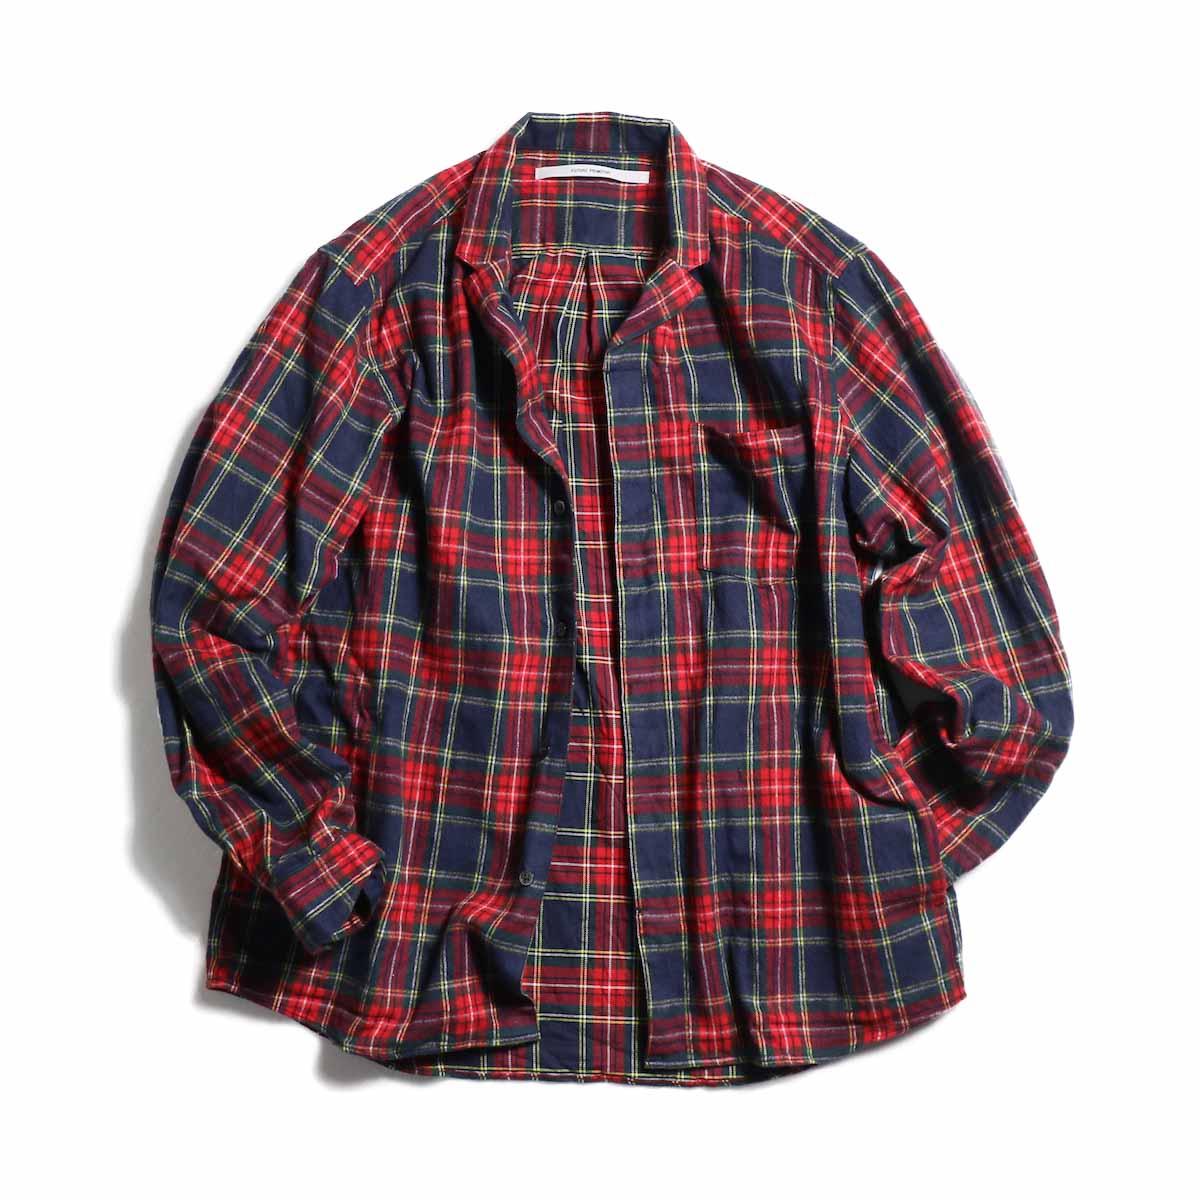 FUTURE PRIMITIVE / FP Notched Shirt(Tartan) -Navy 正面(開)